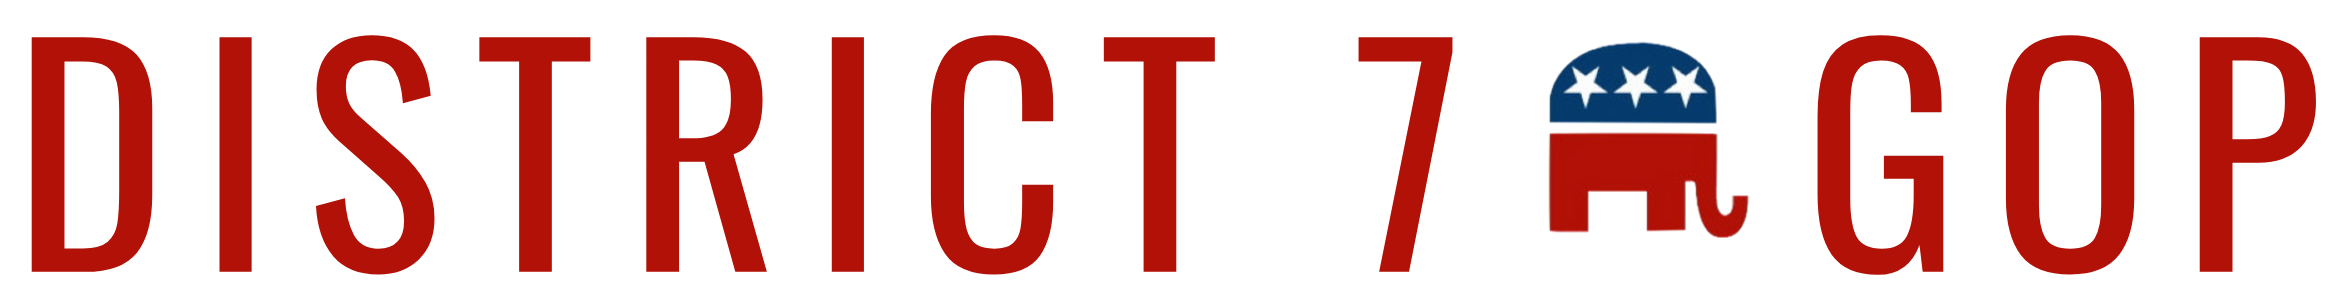 NC GOP Congressional District 7